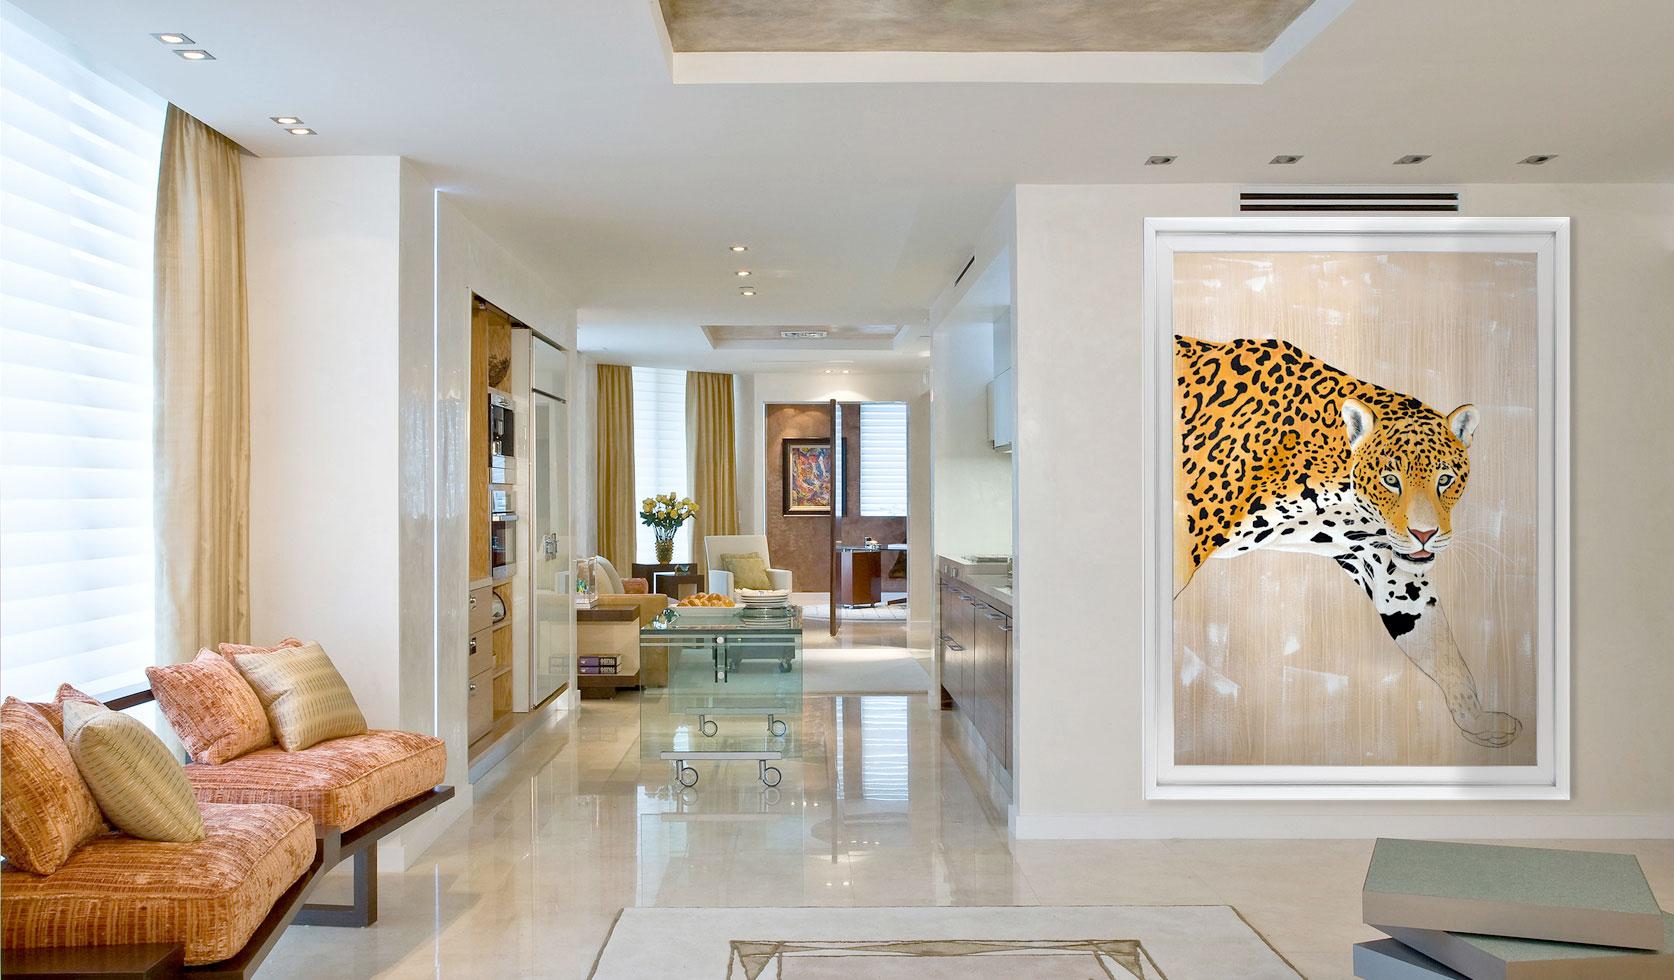 panthera onca jaguar panthera onca panth re d co d coration toile imprim e grand format b che. Black Bedroom Furniture Sets. Home Design Ideas